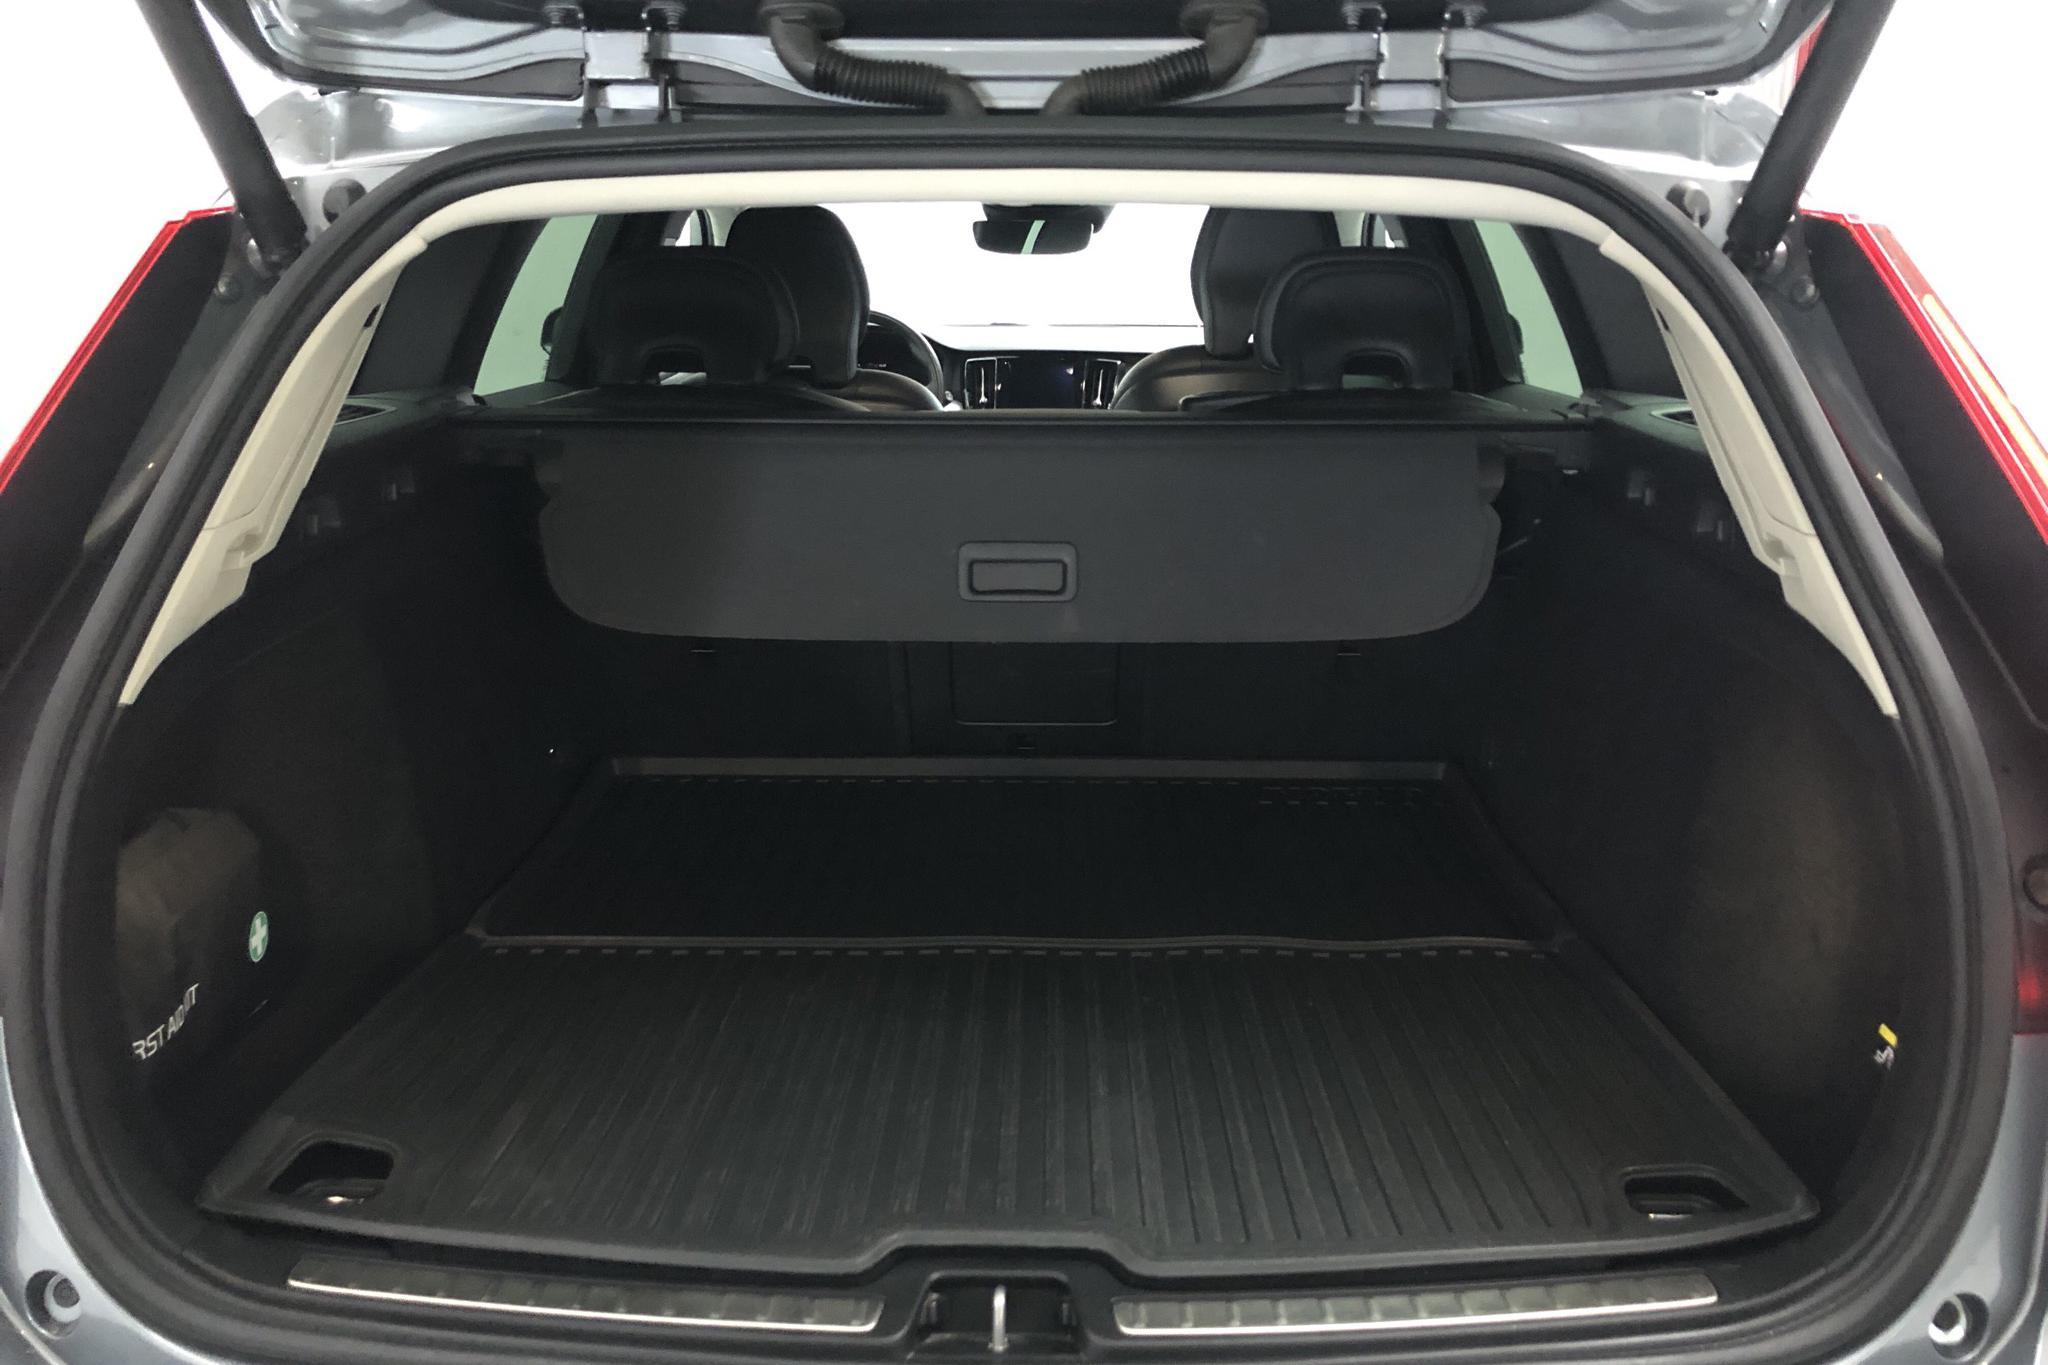 Volvo V60 D4 Cross Country AWD (190hk) - 4 867 mil - Automat - grå - 2019